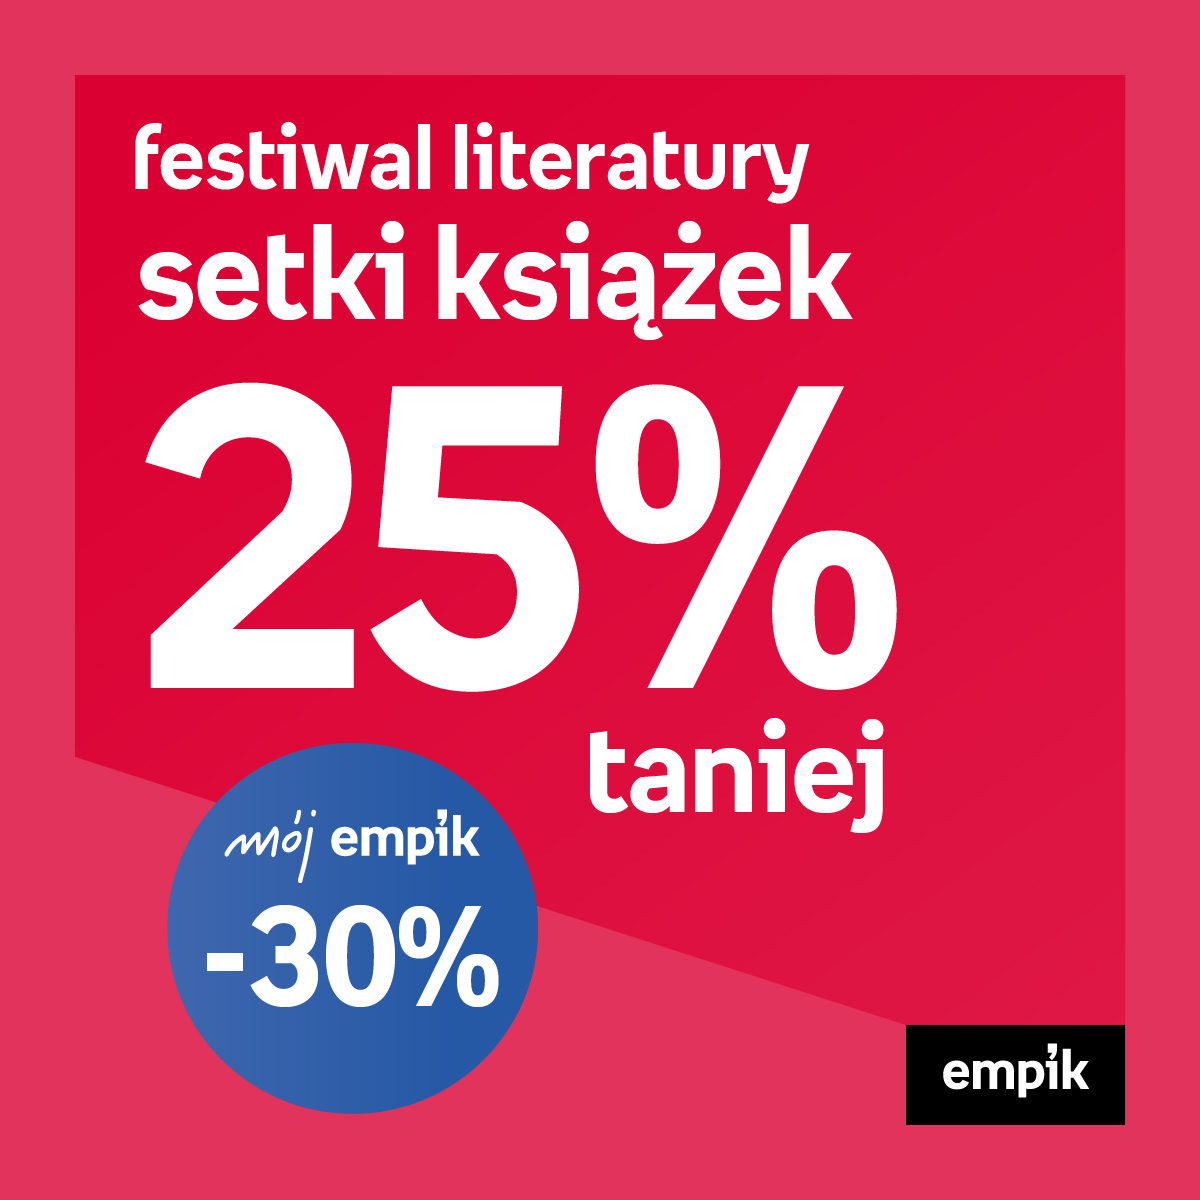 Wielki Festiwal Literatury w Empik!